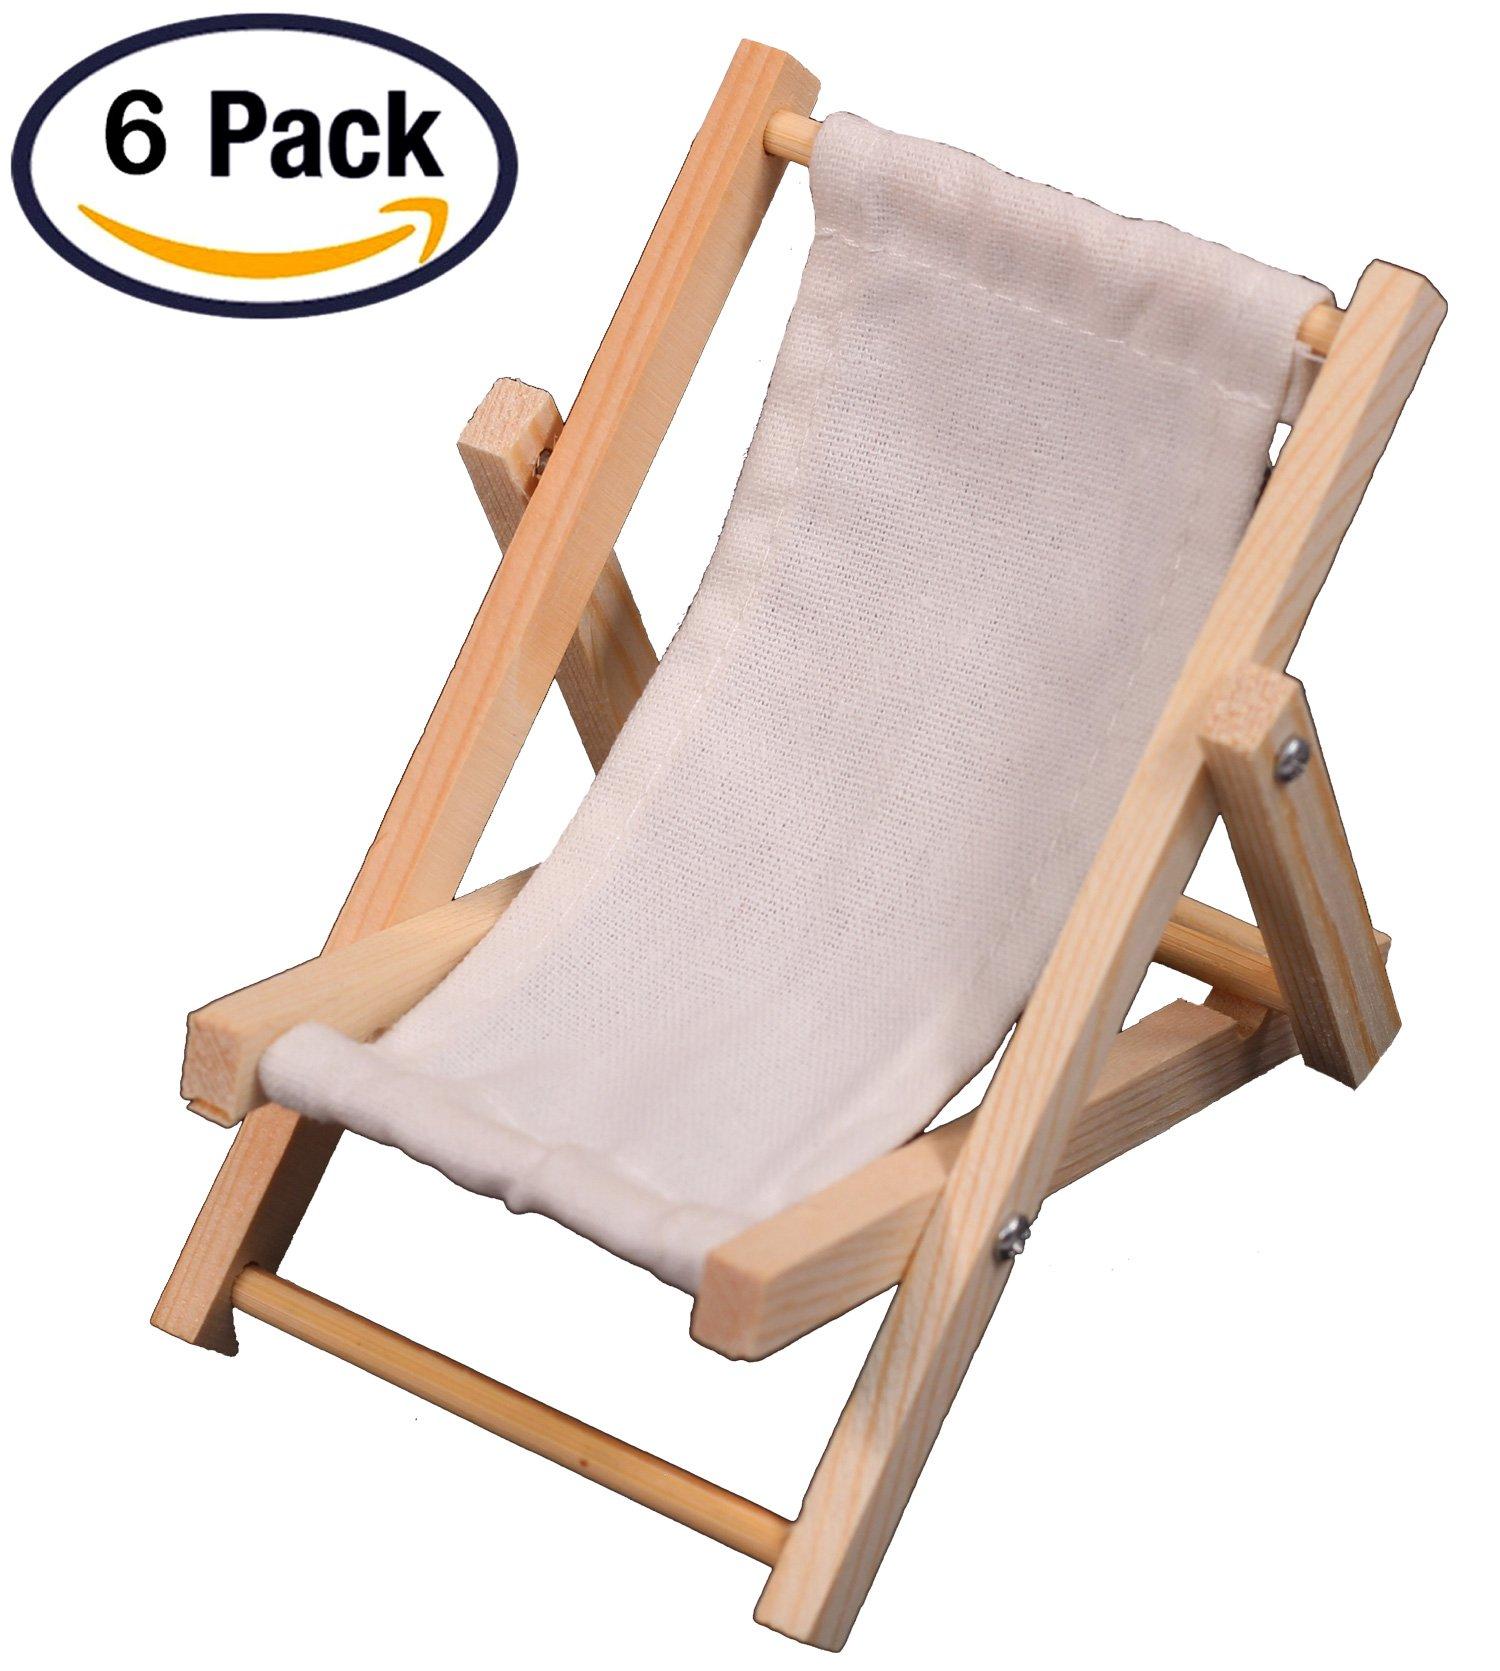 Cheap White Beach Chairs Find White Beach Chairs Deals On Line At Alibaba Com